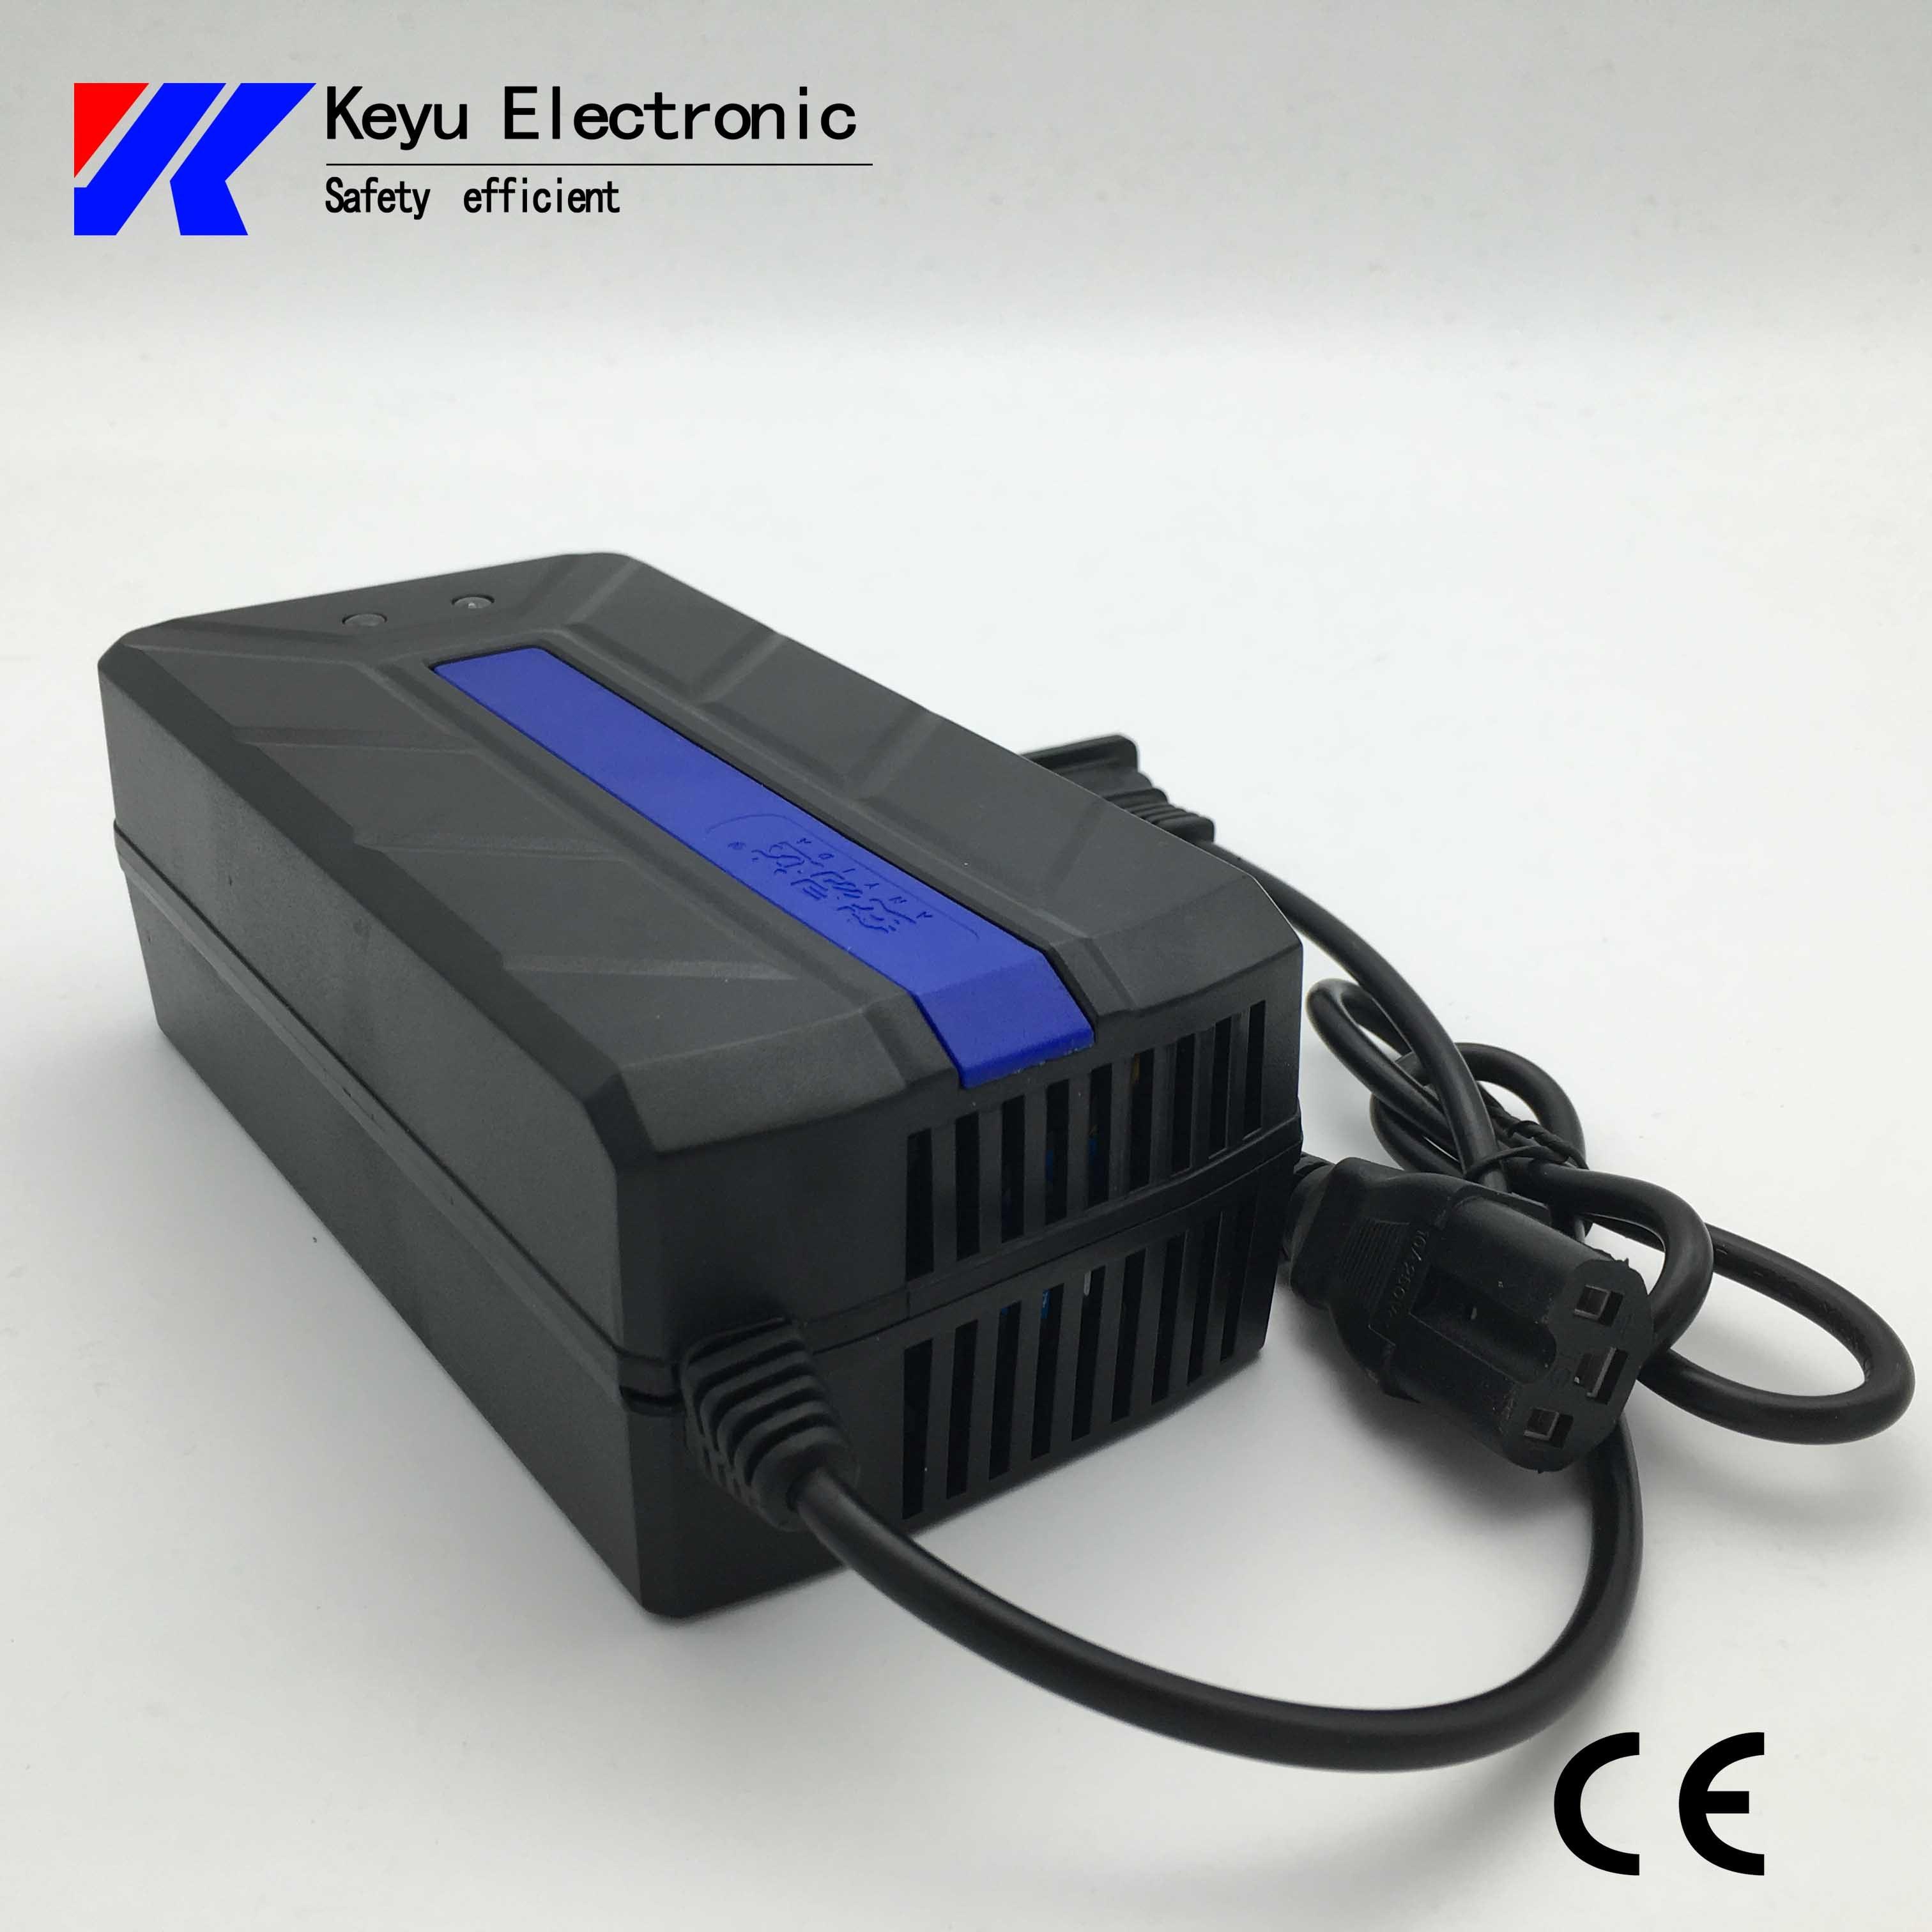 AN YI DA Ebike Charger60V-20ah (Lead Acid battery)